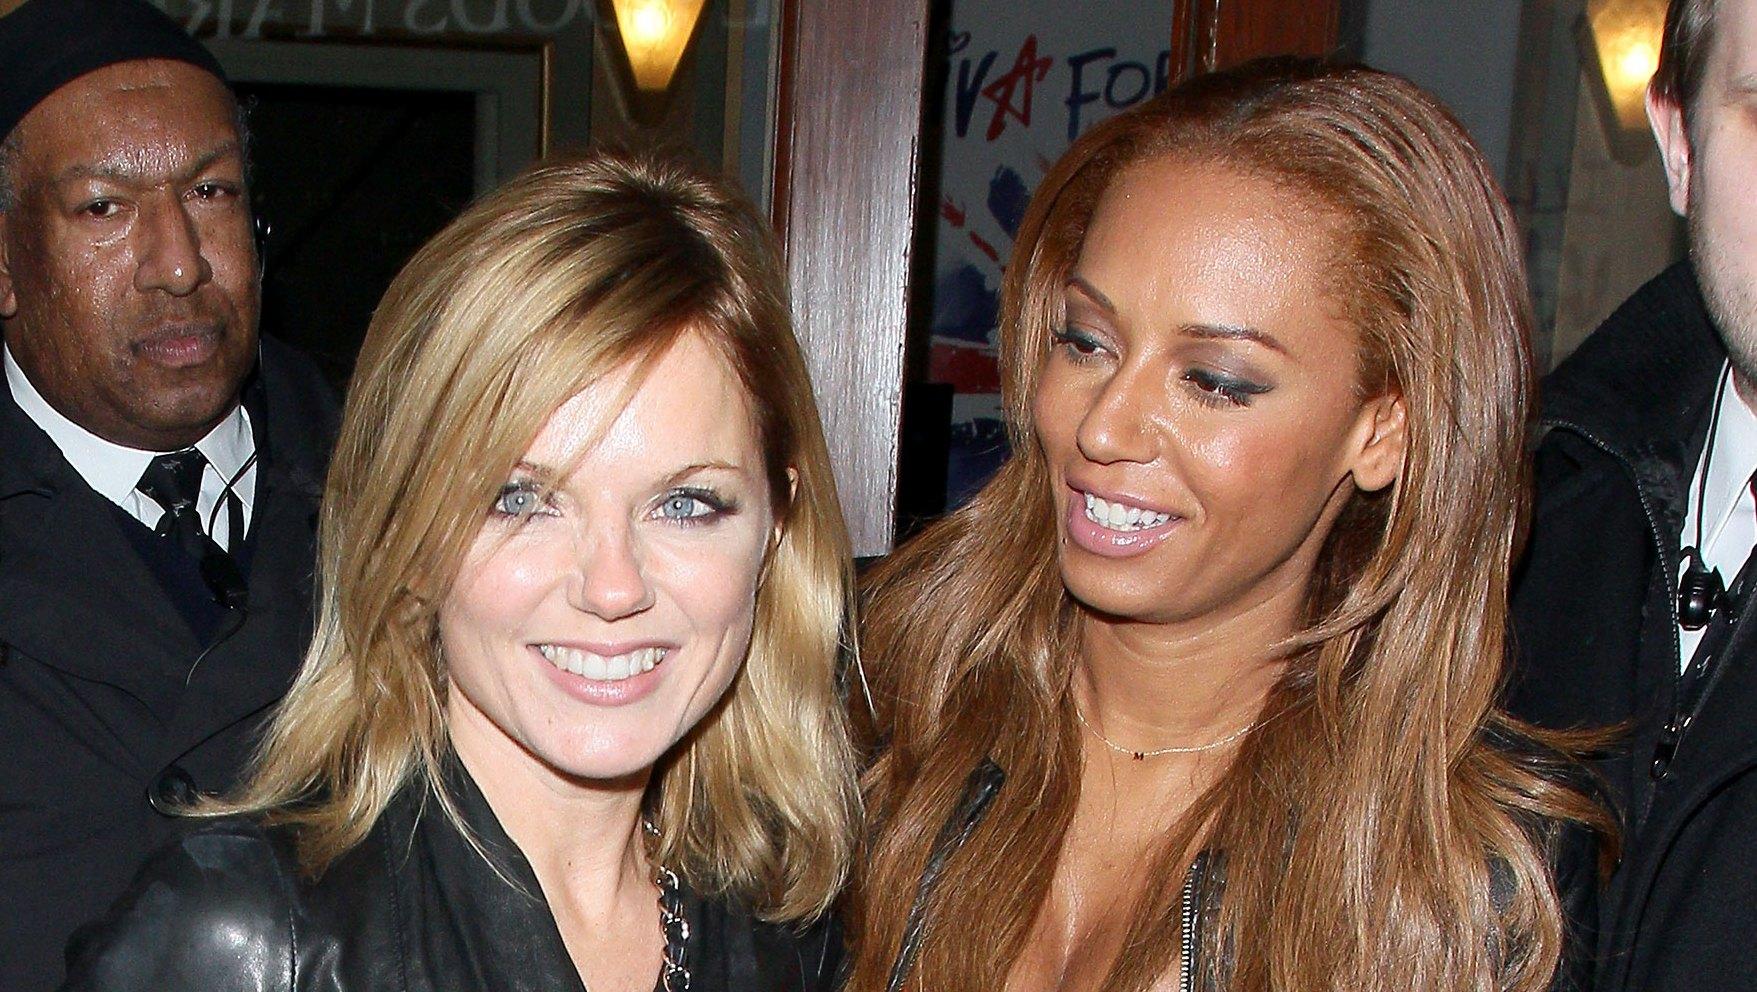 Mel B Downplays Claims She Had Sex With Spice Girl Geri Halliwell